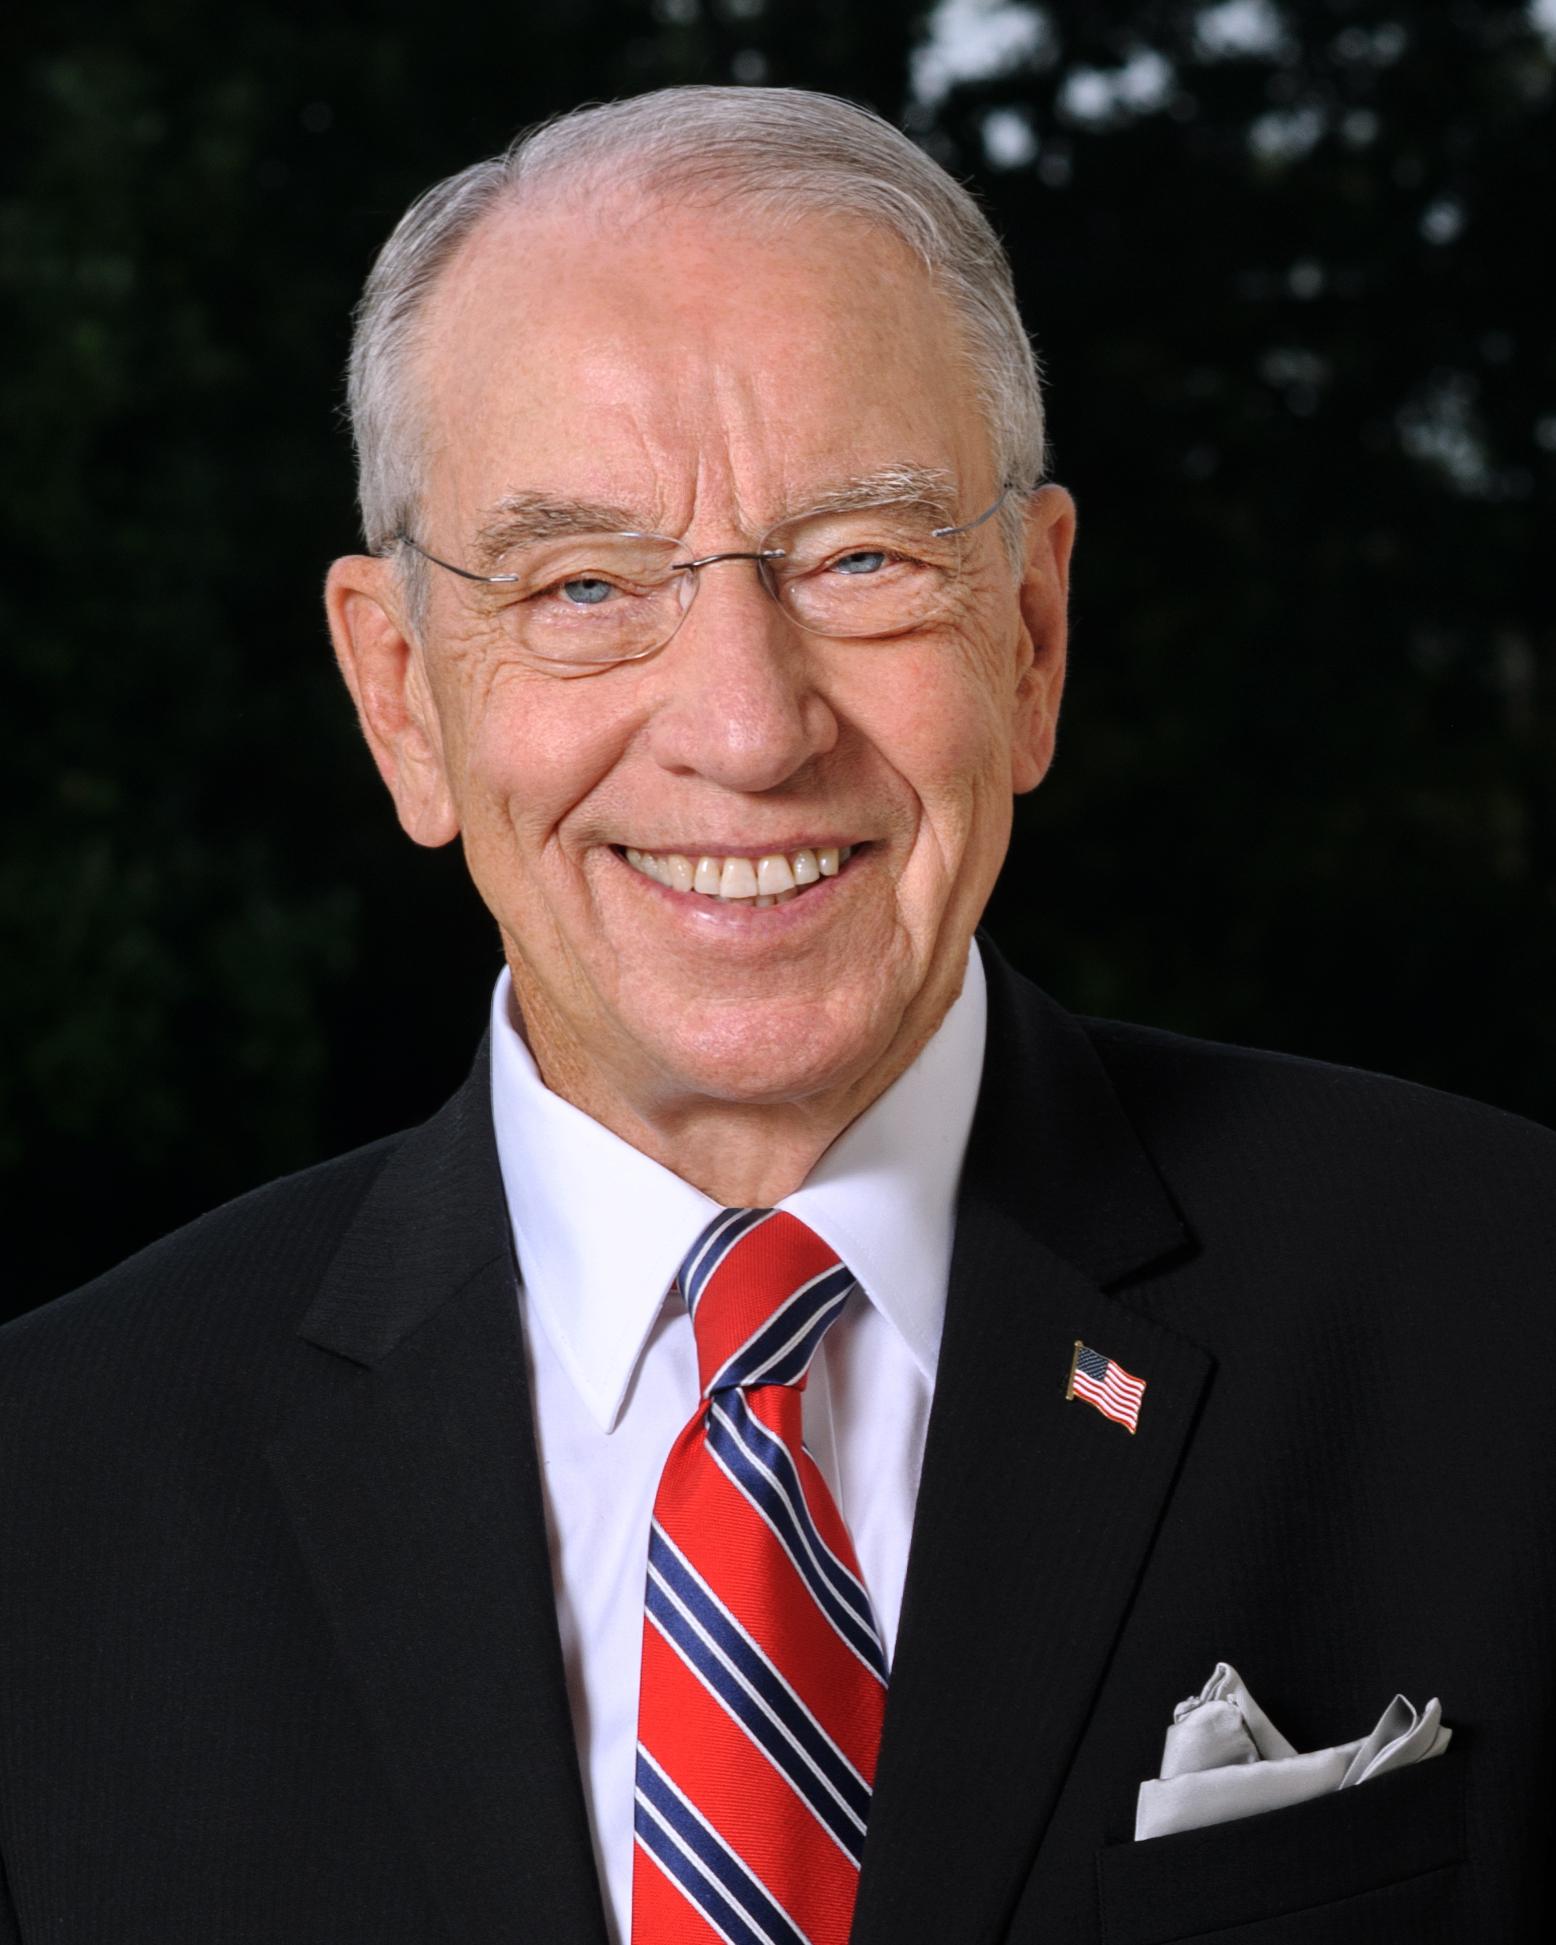 Чарльз Грэссли. Фото: United States Congress